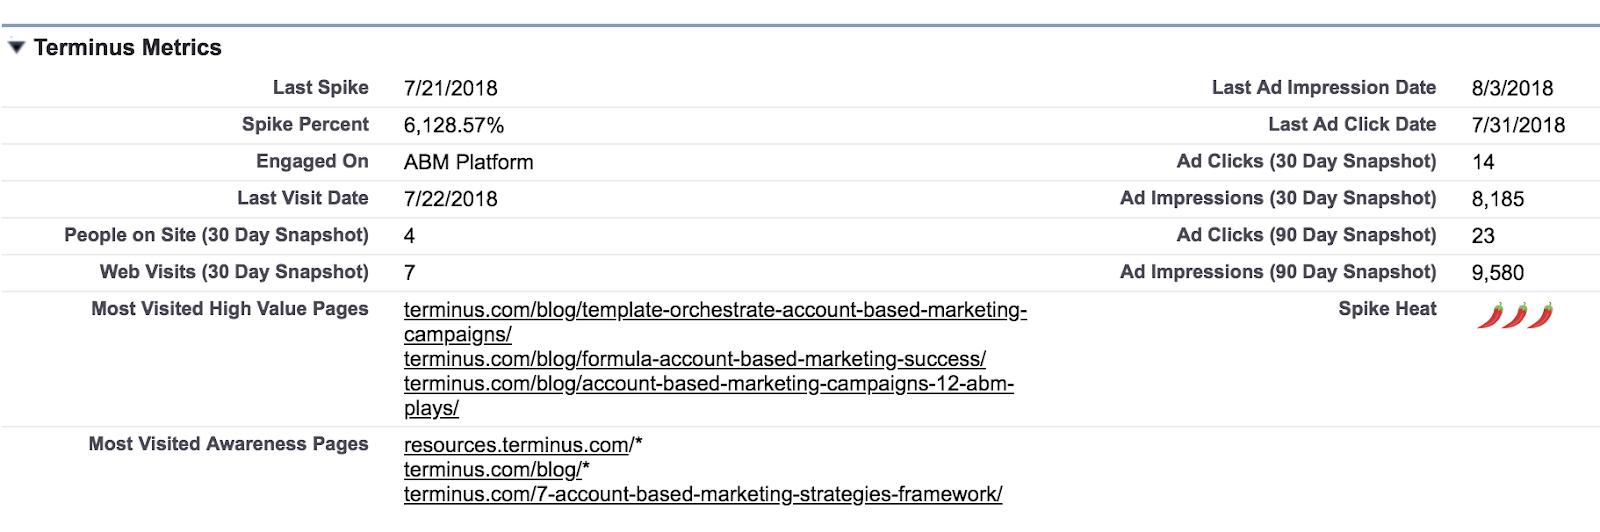 Terminus metrics